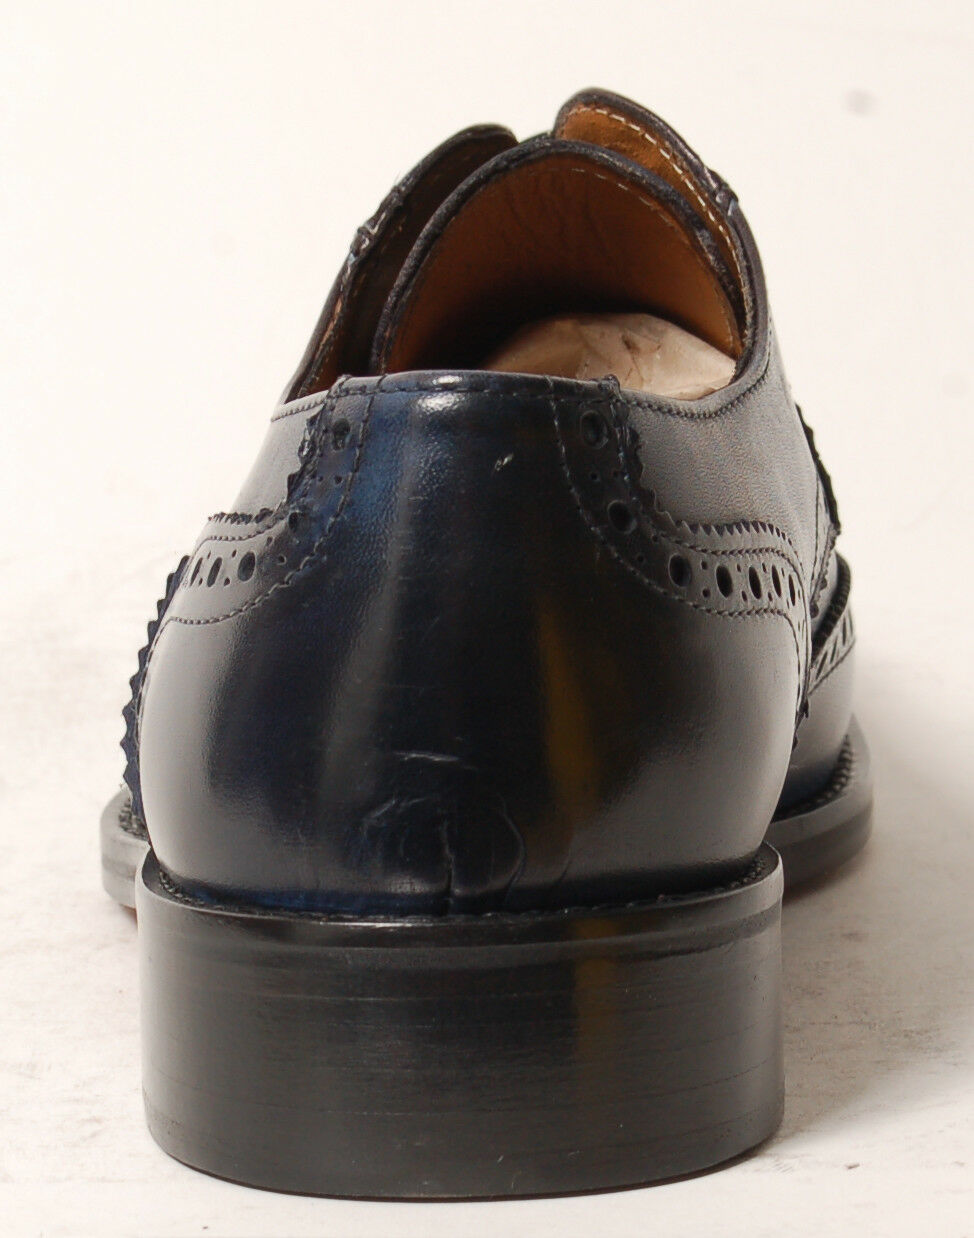 Chaussures - ! Antica Calzoleria Campana Mod. 1220 Déstockage ! - 30% Remise b518ac